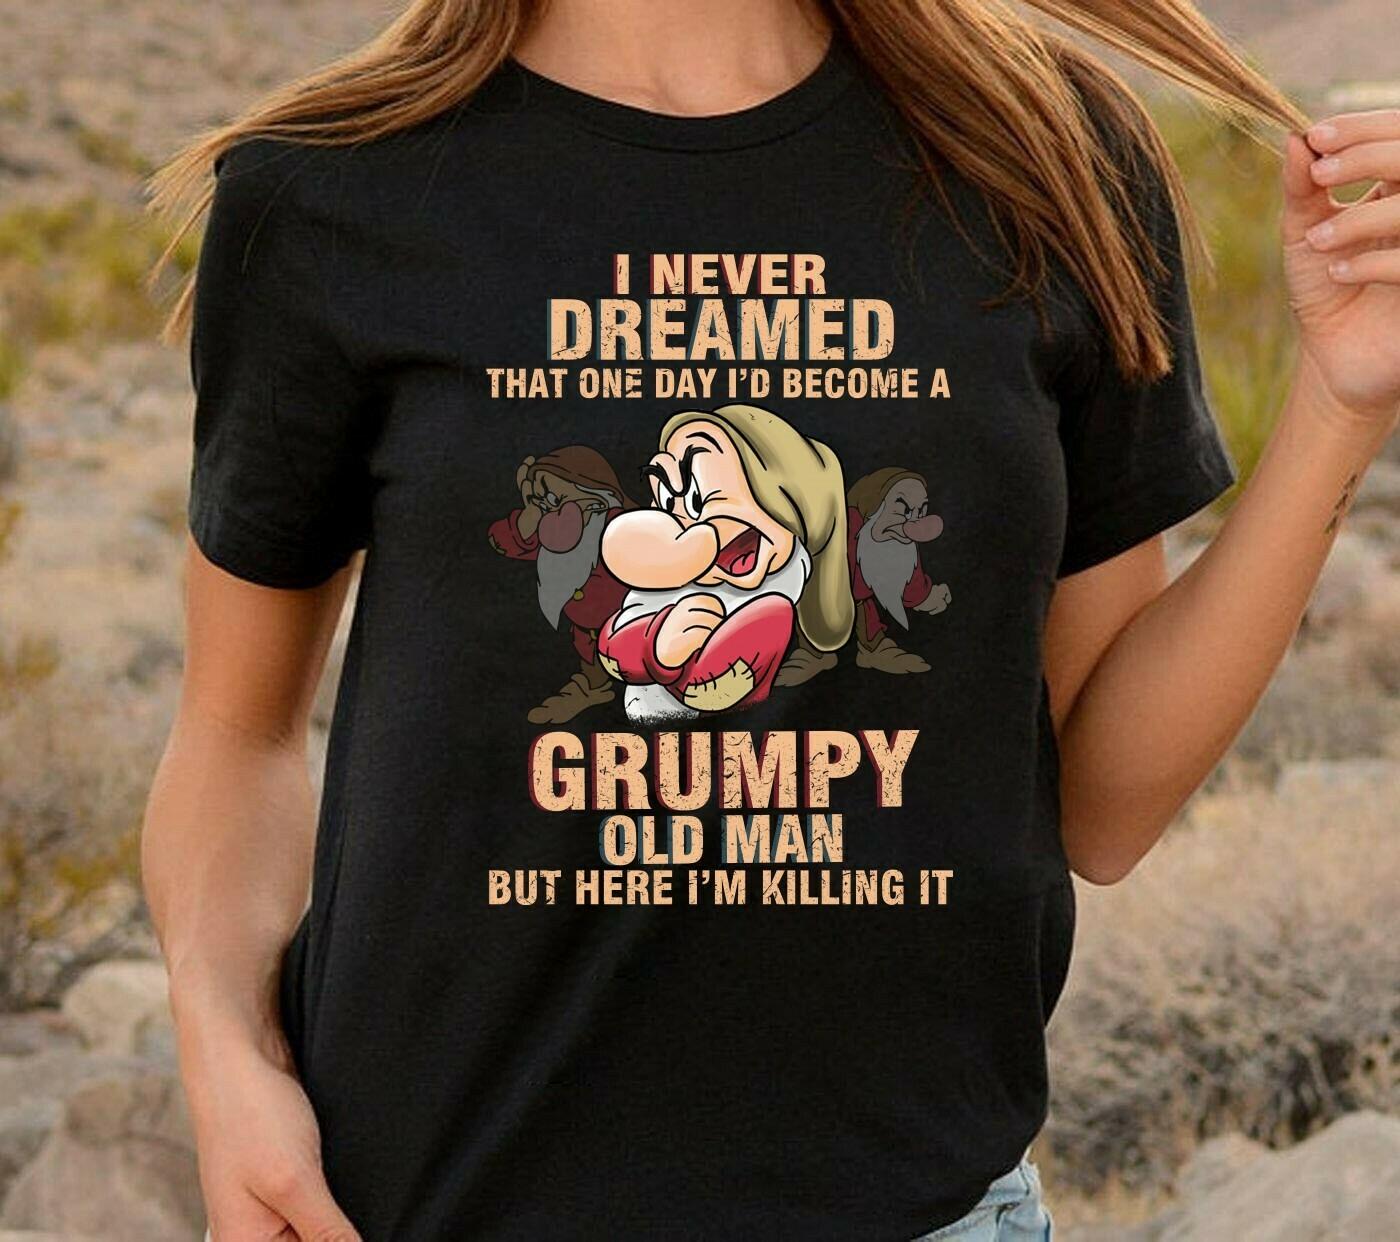 Disney Grumpy Dwarf I Never Dreamed,Disney Grumpy Old Man,Snow White and the Seven Dwarfs,Walt Disney World,Dopey Seven Dwarfs T Shirt Long Sleeve Sweatshirt Hoodie Jolly Family Gifts